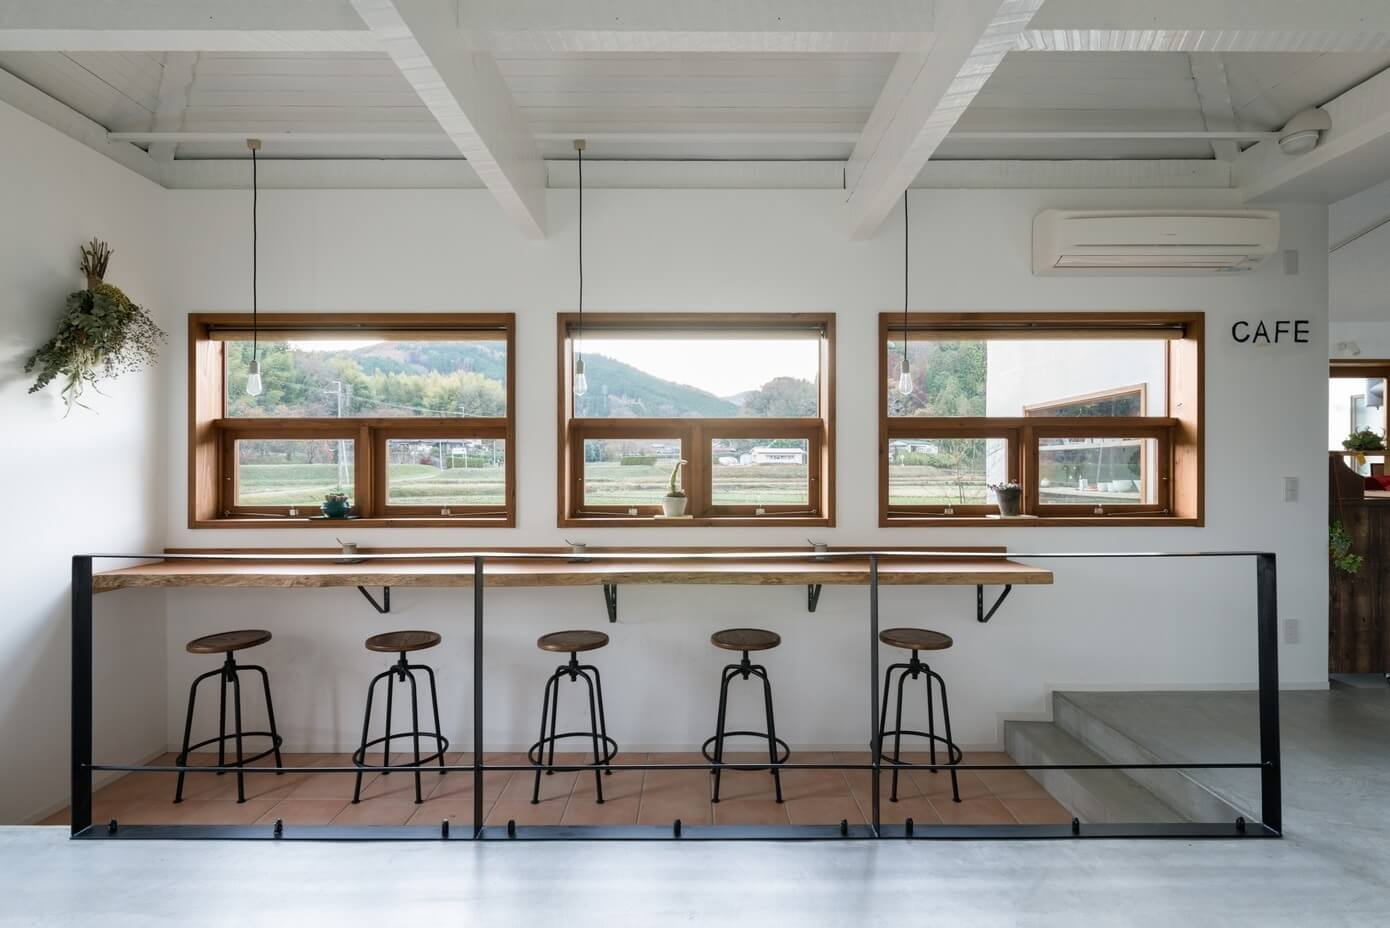 satoduto-coil-kazuteru-matumura-architects-08